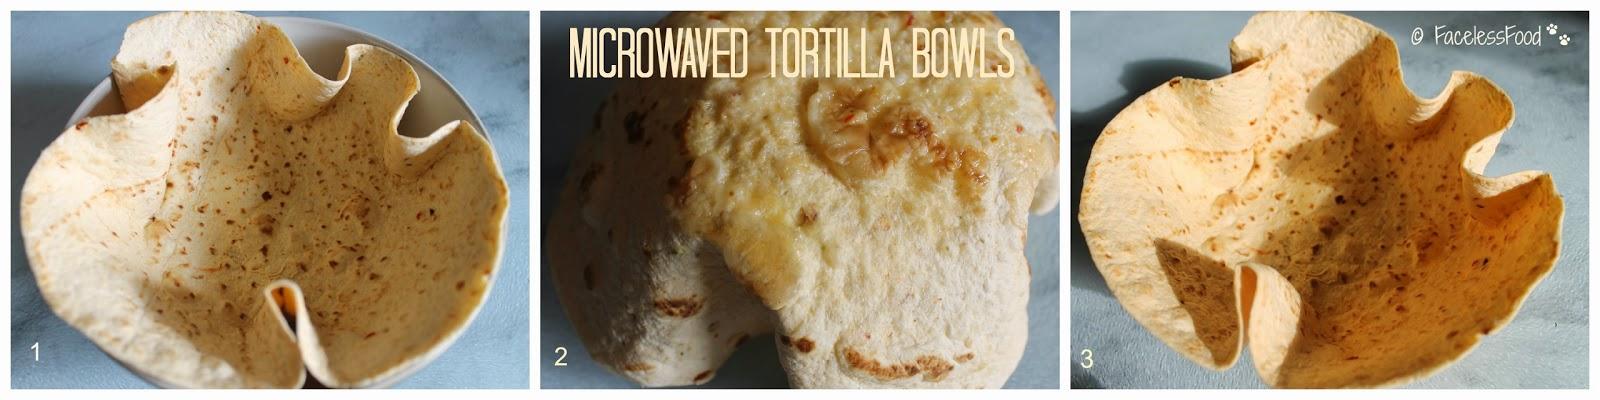 microwaved tortilla bowls